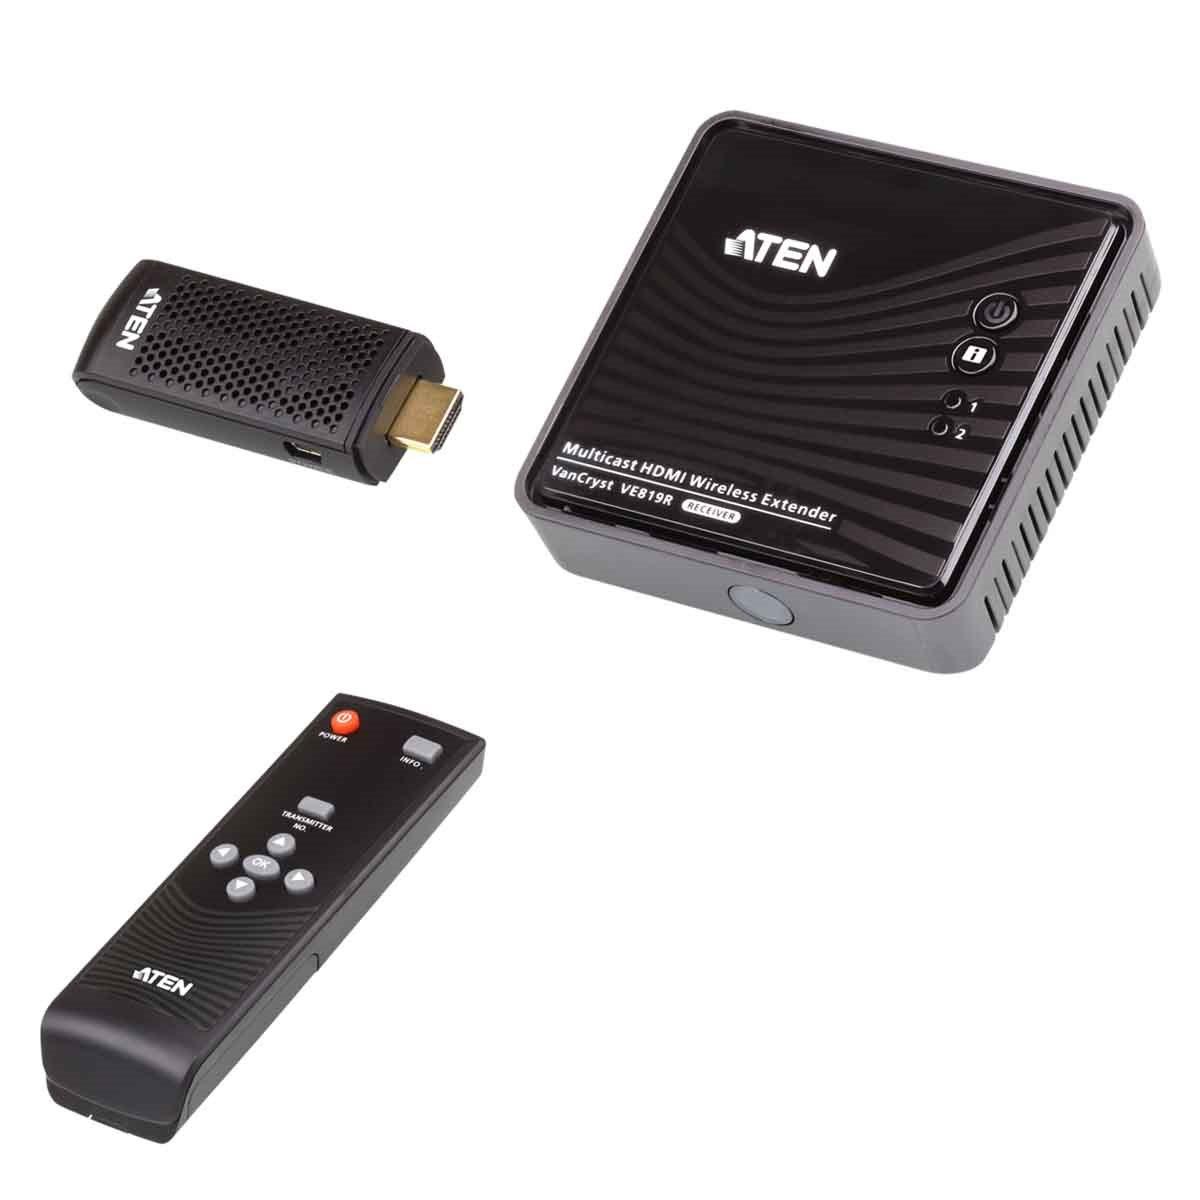 Aten (Ve819-Ata-U) Hdmi Wireless Extender Dongle + Receiver